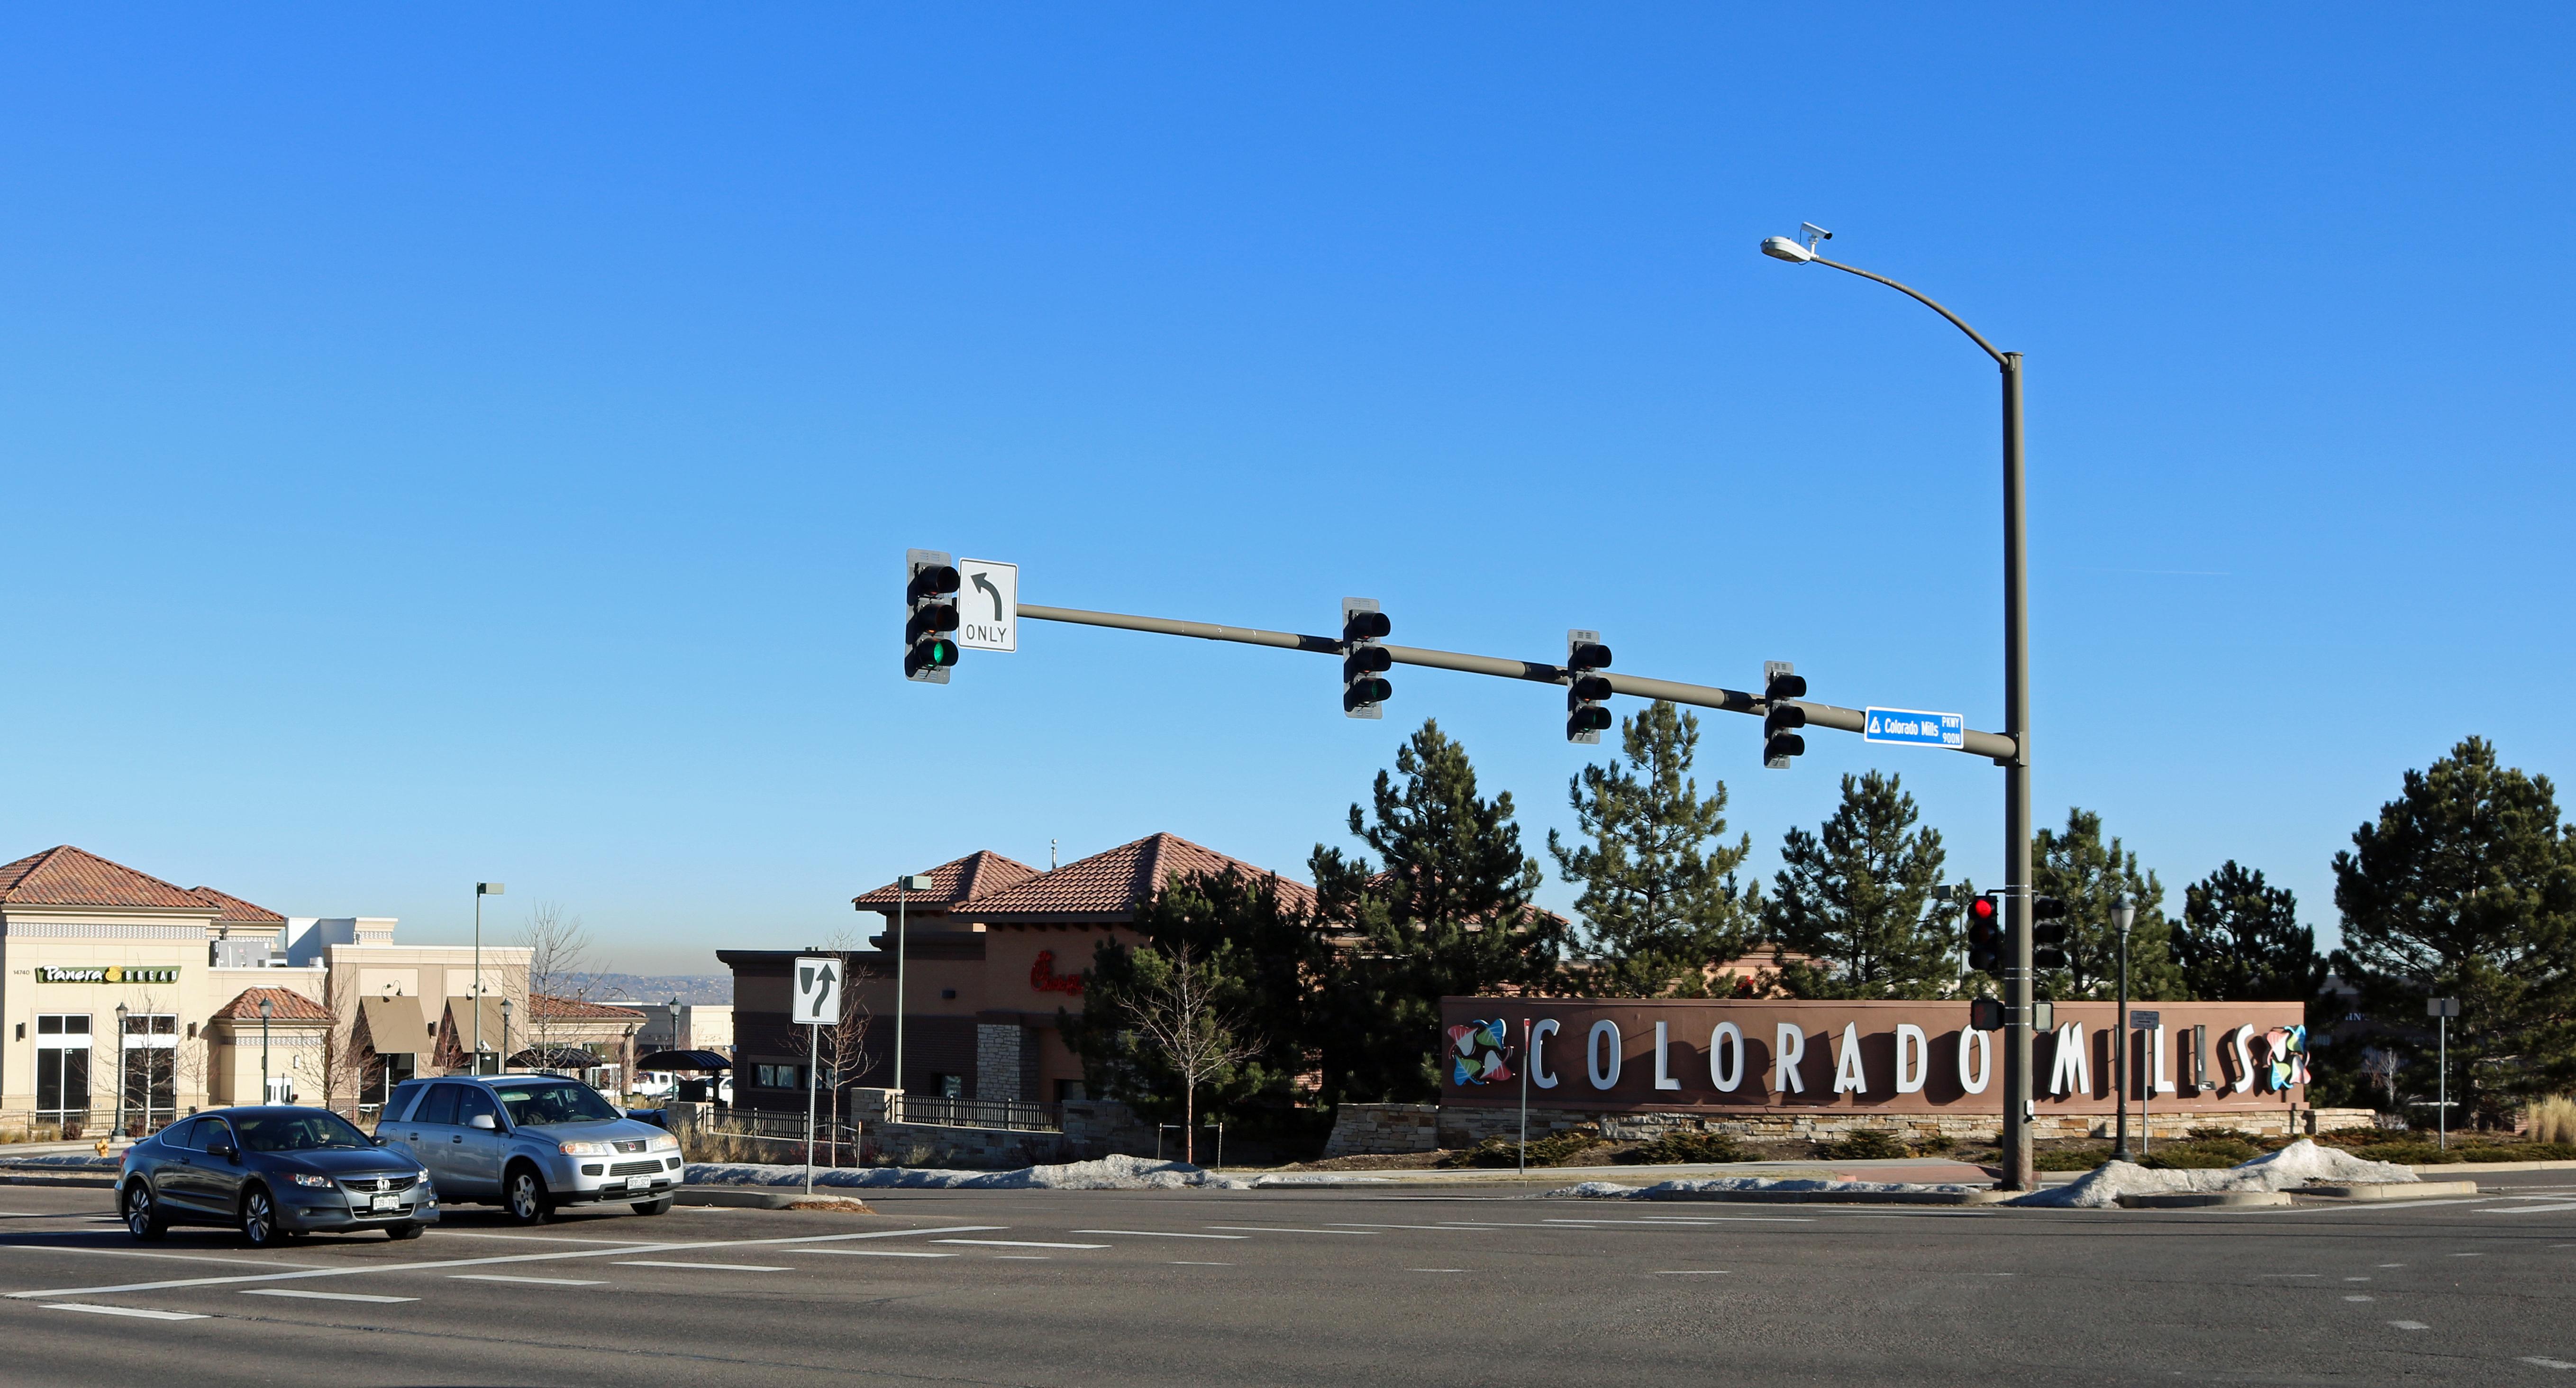 Colorado Mills - Wikipedia